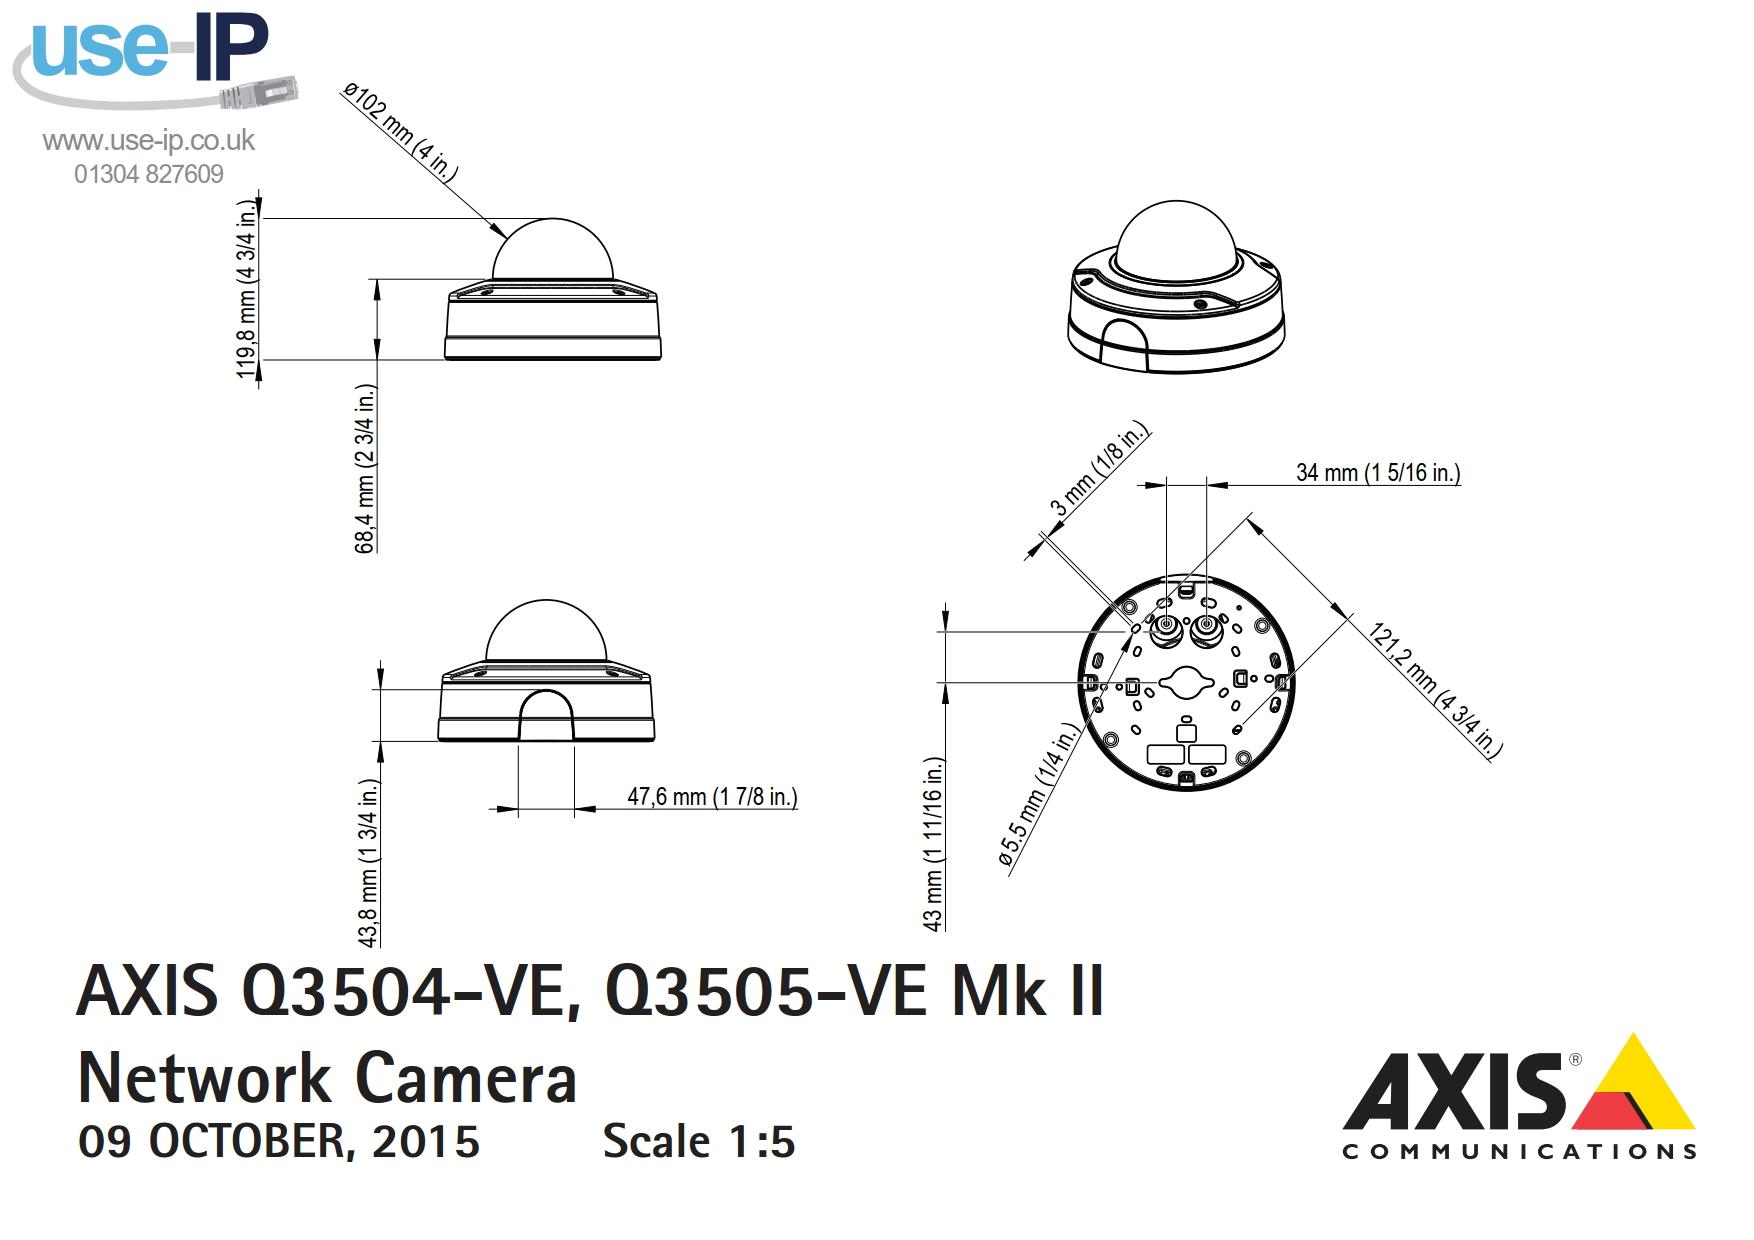 Q3505-VE MkII